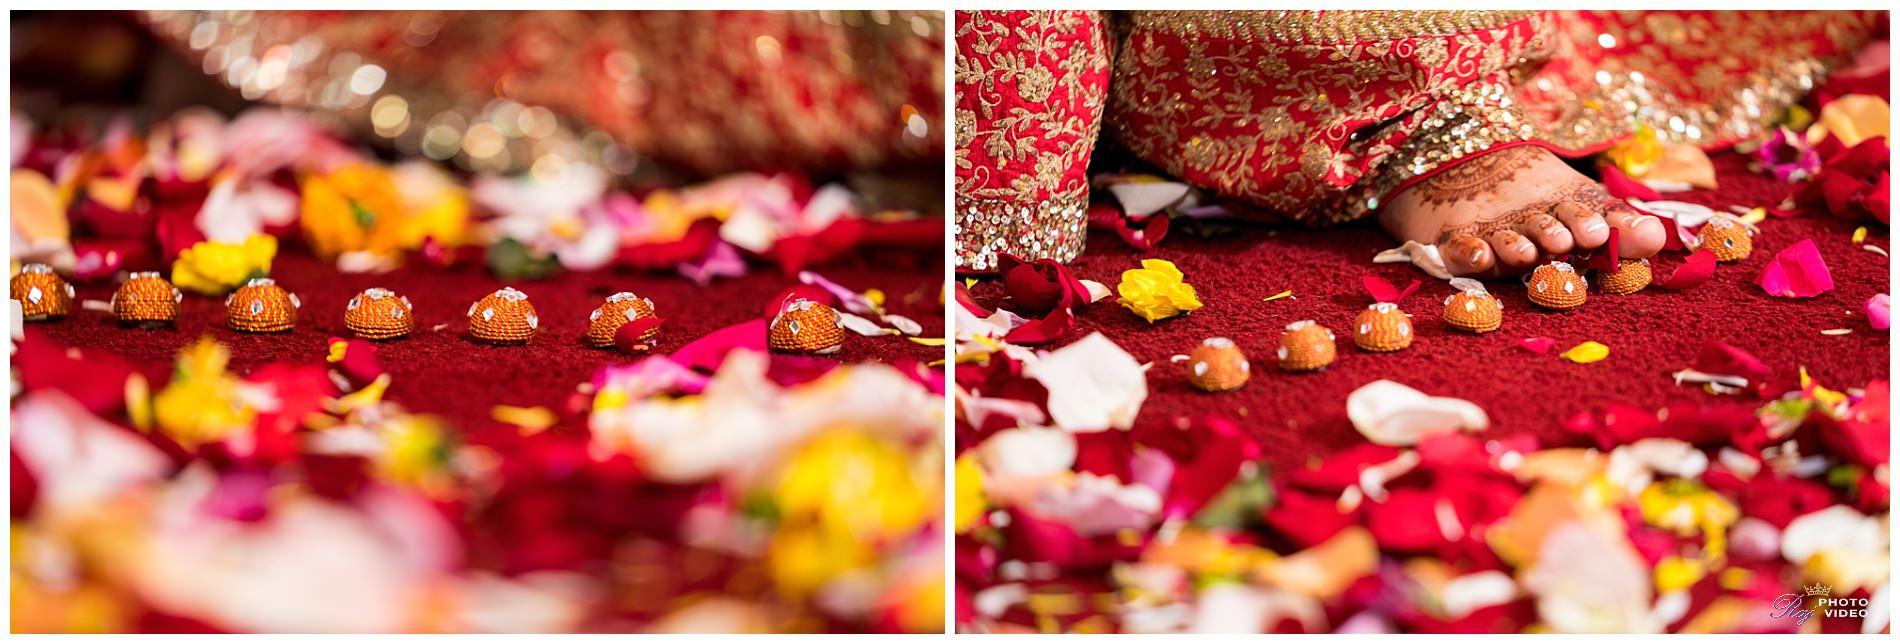 doubletree-by-hilton-hotel-wilmington-de-wedding-krishna-ritesh-67.jpg